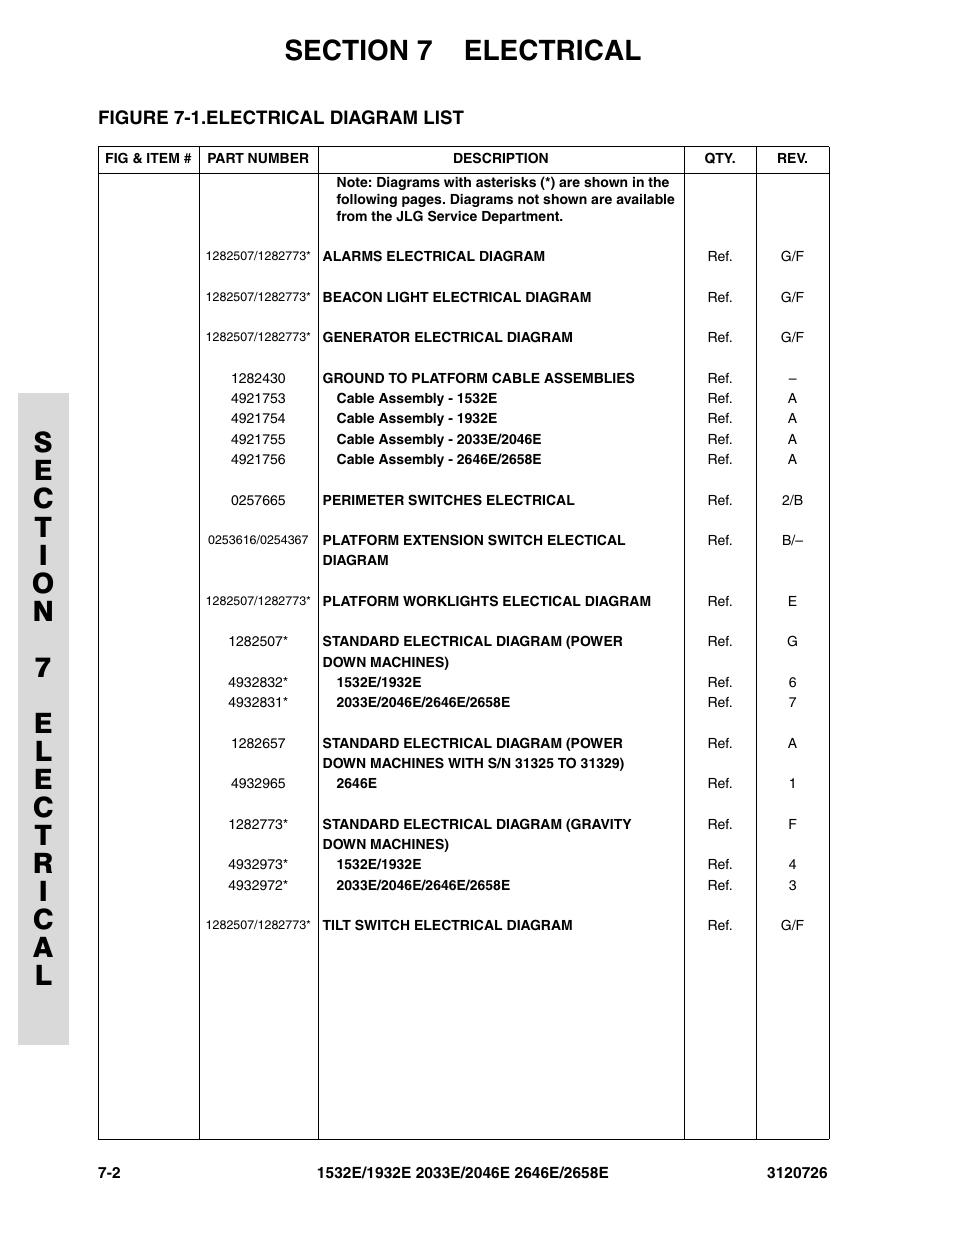 Jlg Wiring Diagram For Generator Electrical Schematics Ansi Figure 7 1 List 2